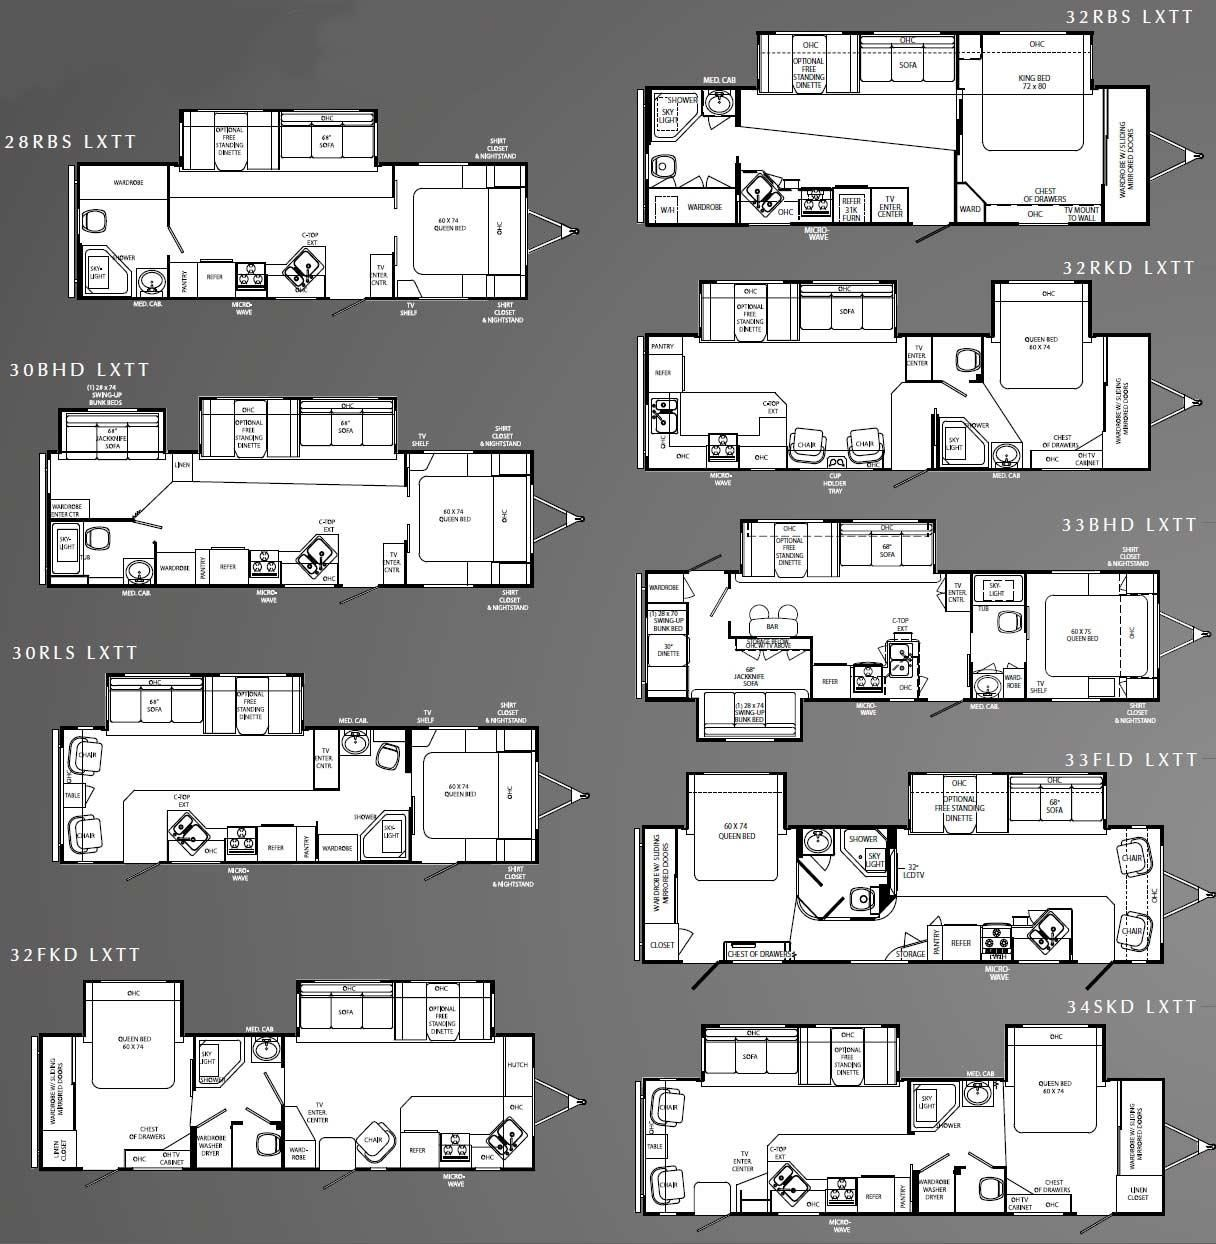 2006 Fleetwood Pioneer Travel Trailer Floor Plans  5bf5fc41c